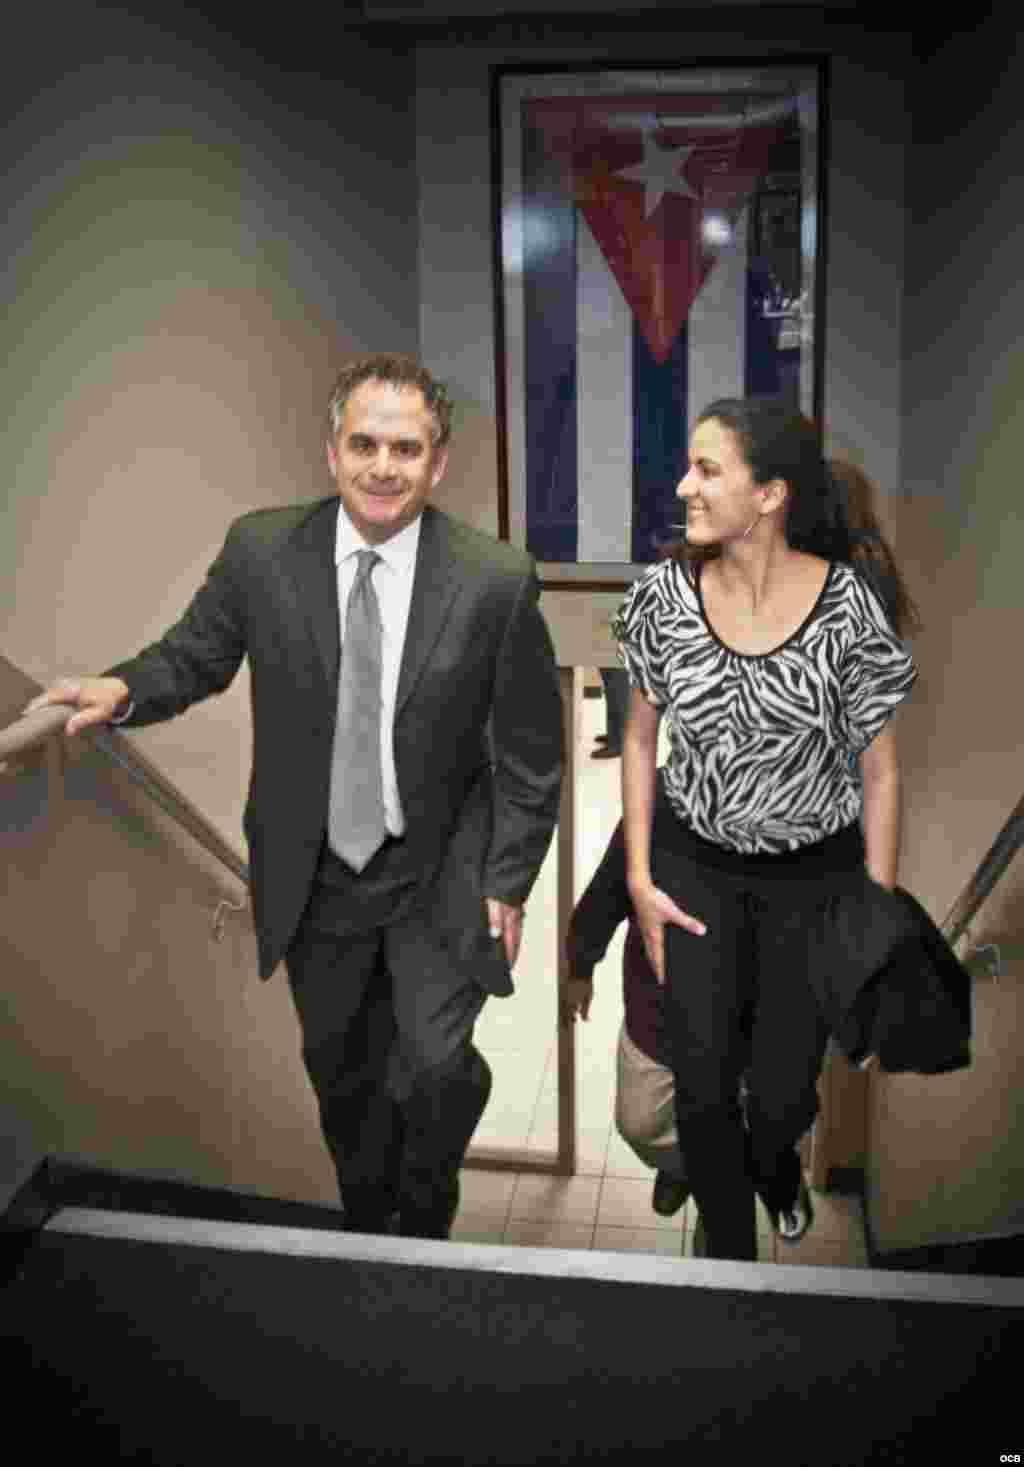 Rosa María Payá makes her way upstairs at the Martis accompanied by OCB Director, Carlos Garcia-Perez